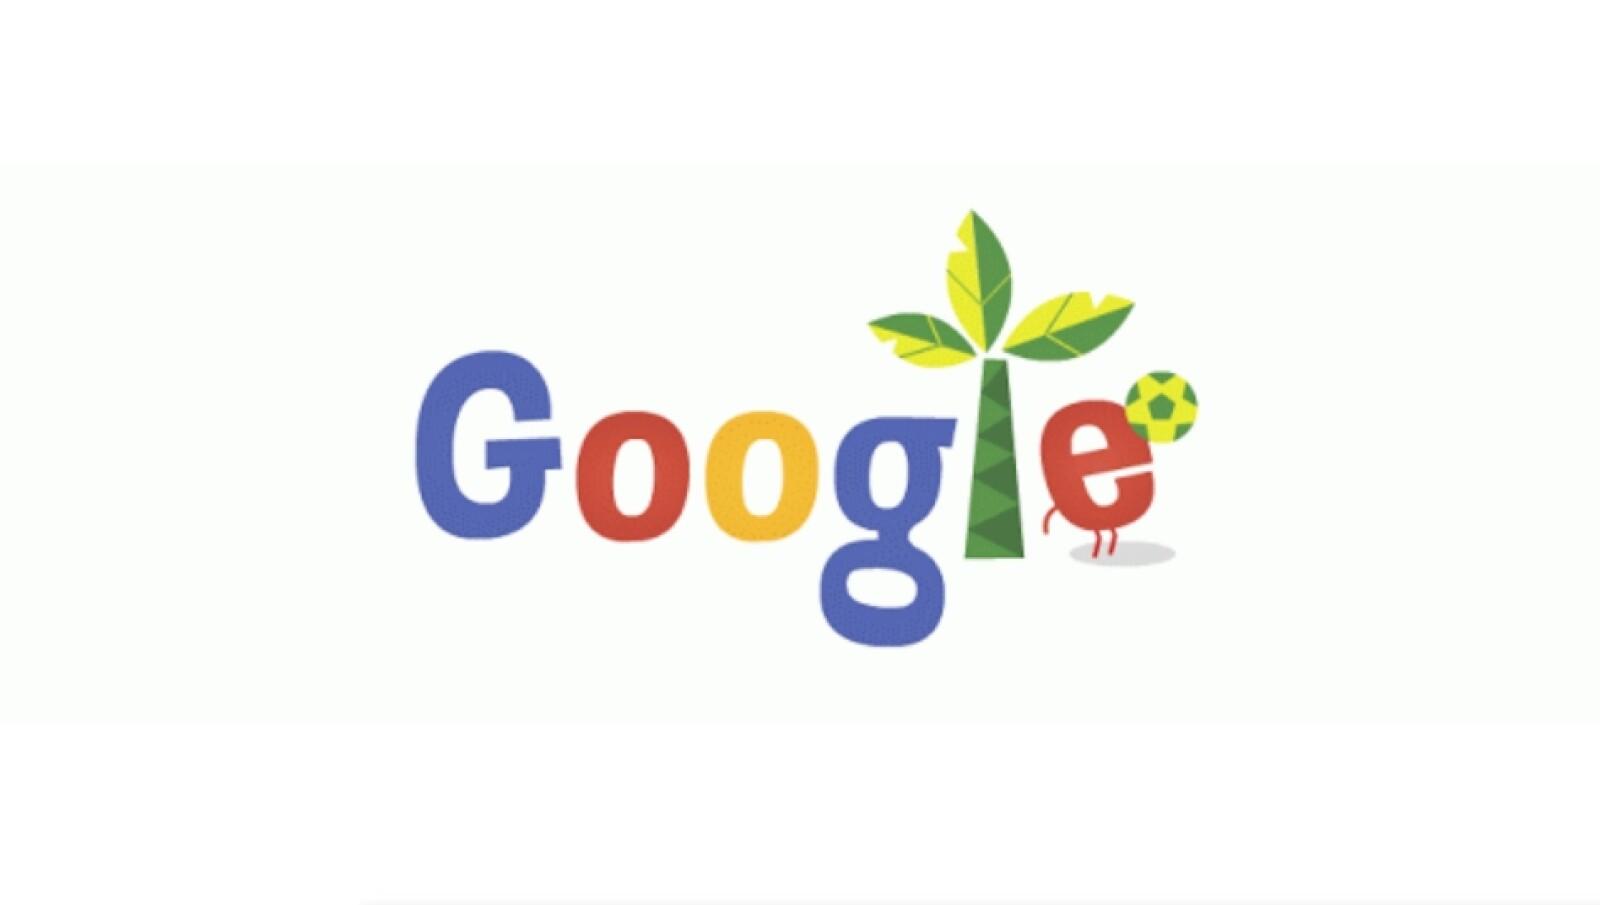 Google doodle 28